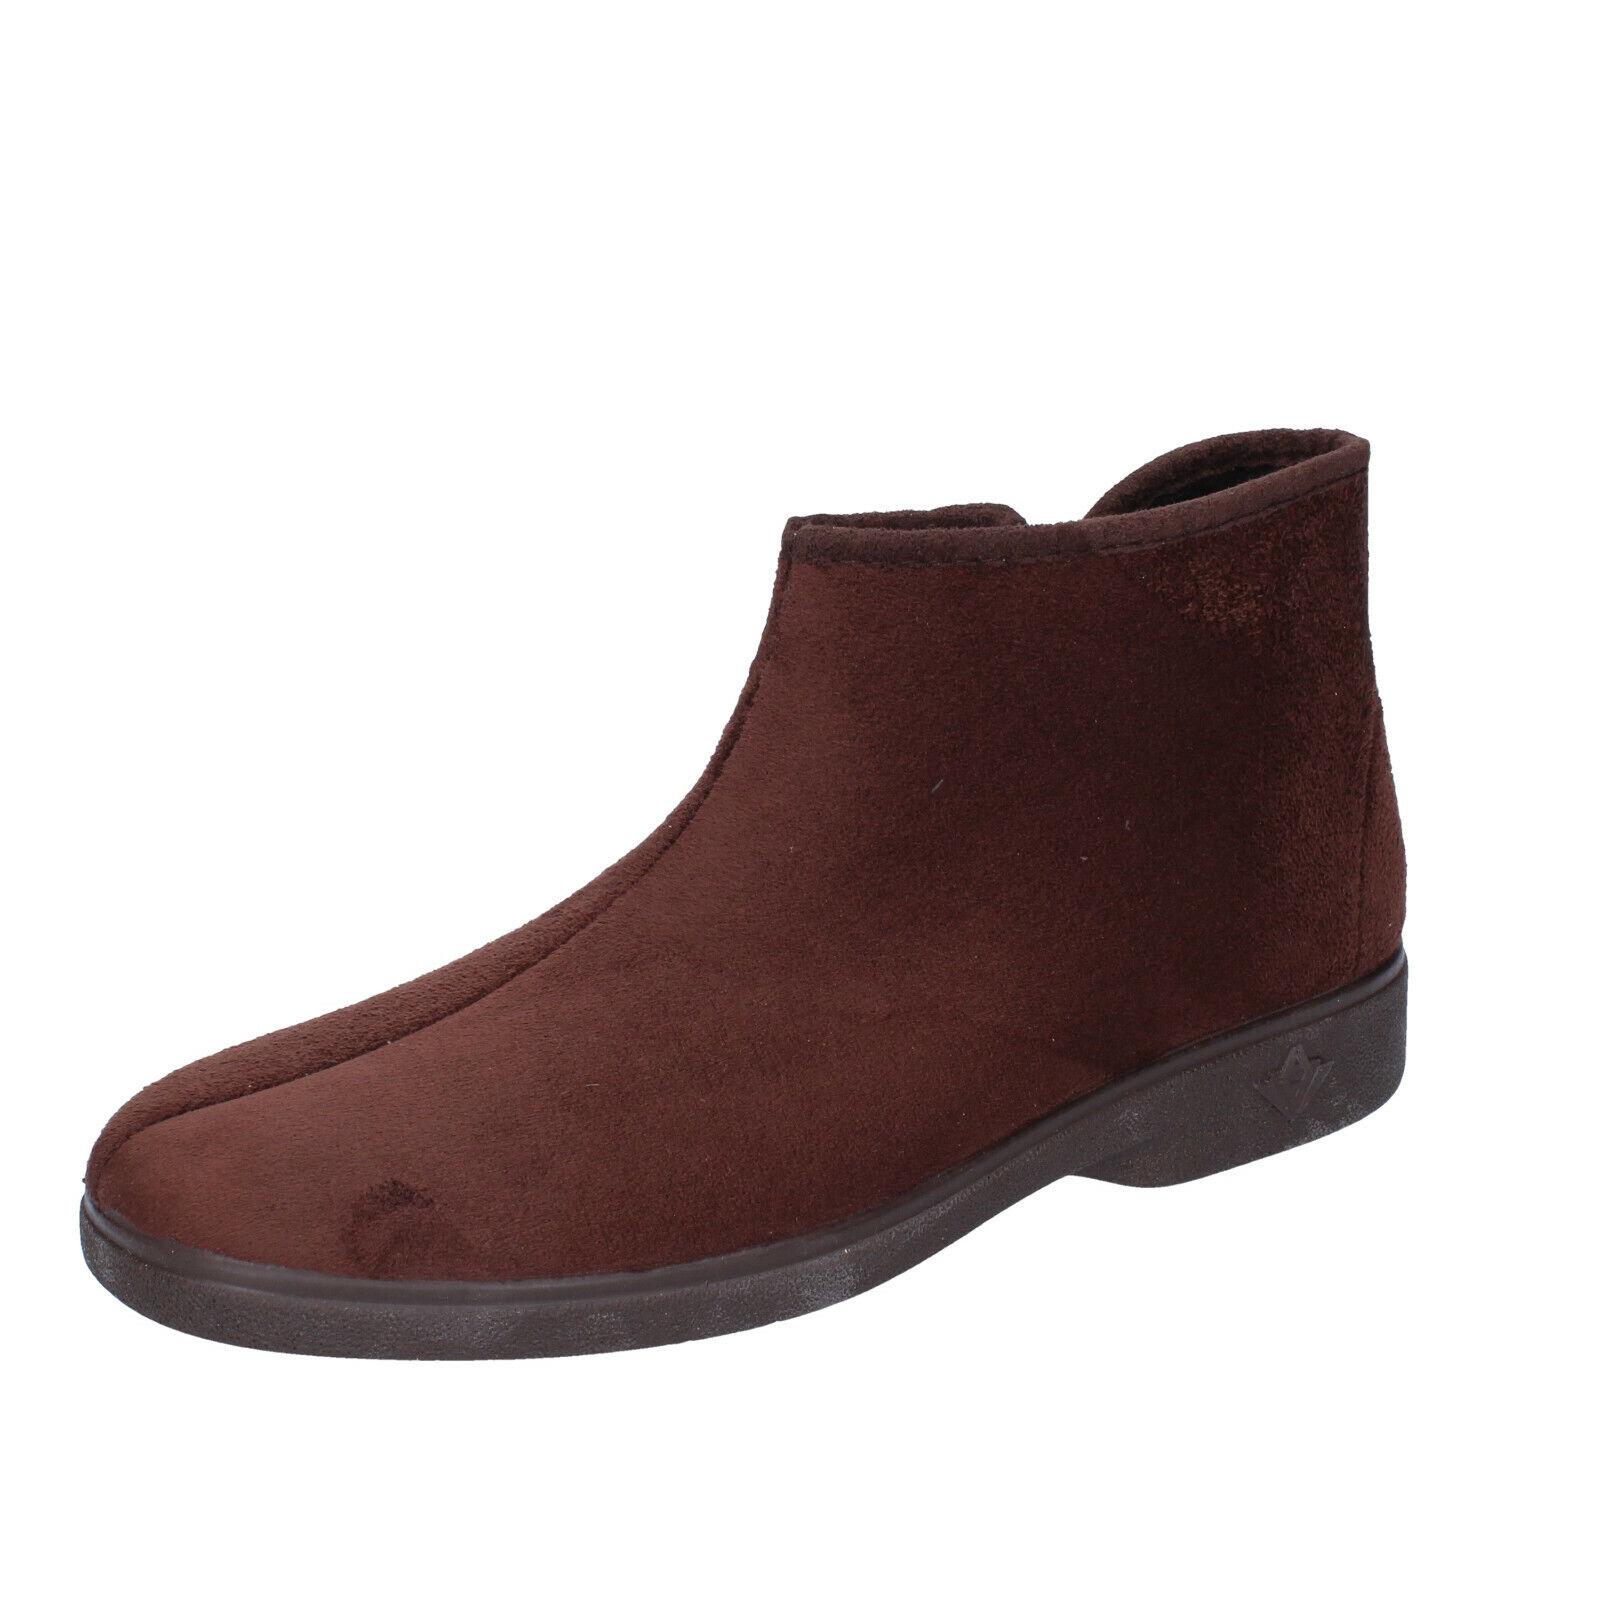 Men's Shoes MAURI MODA 44 Eu Slippers Brown Suede Synthetic BN911-44